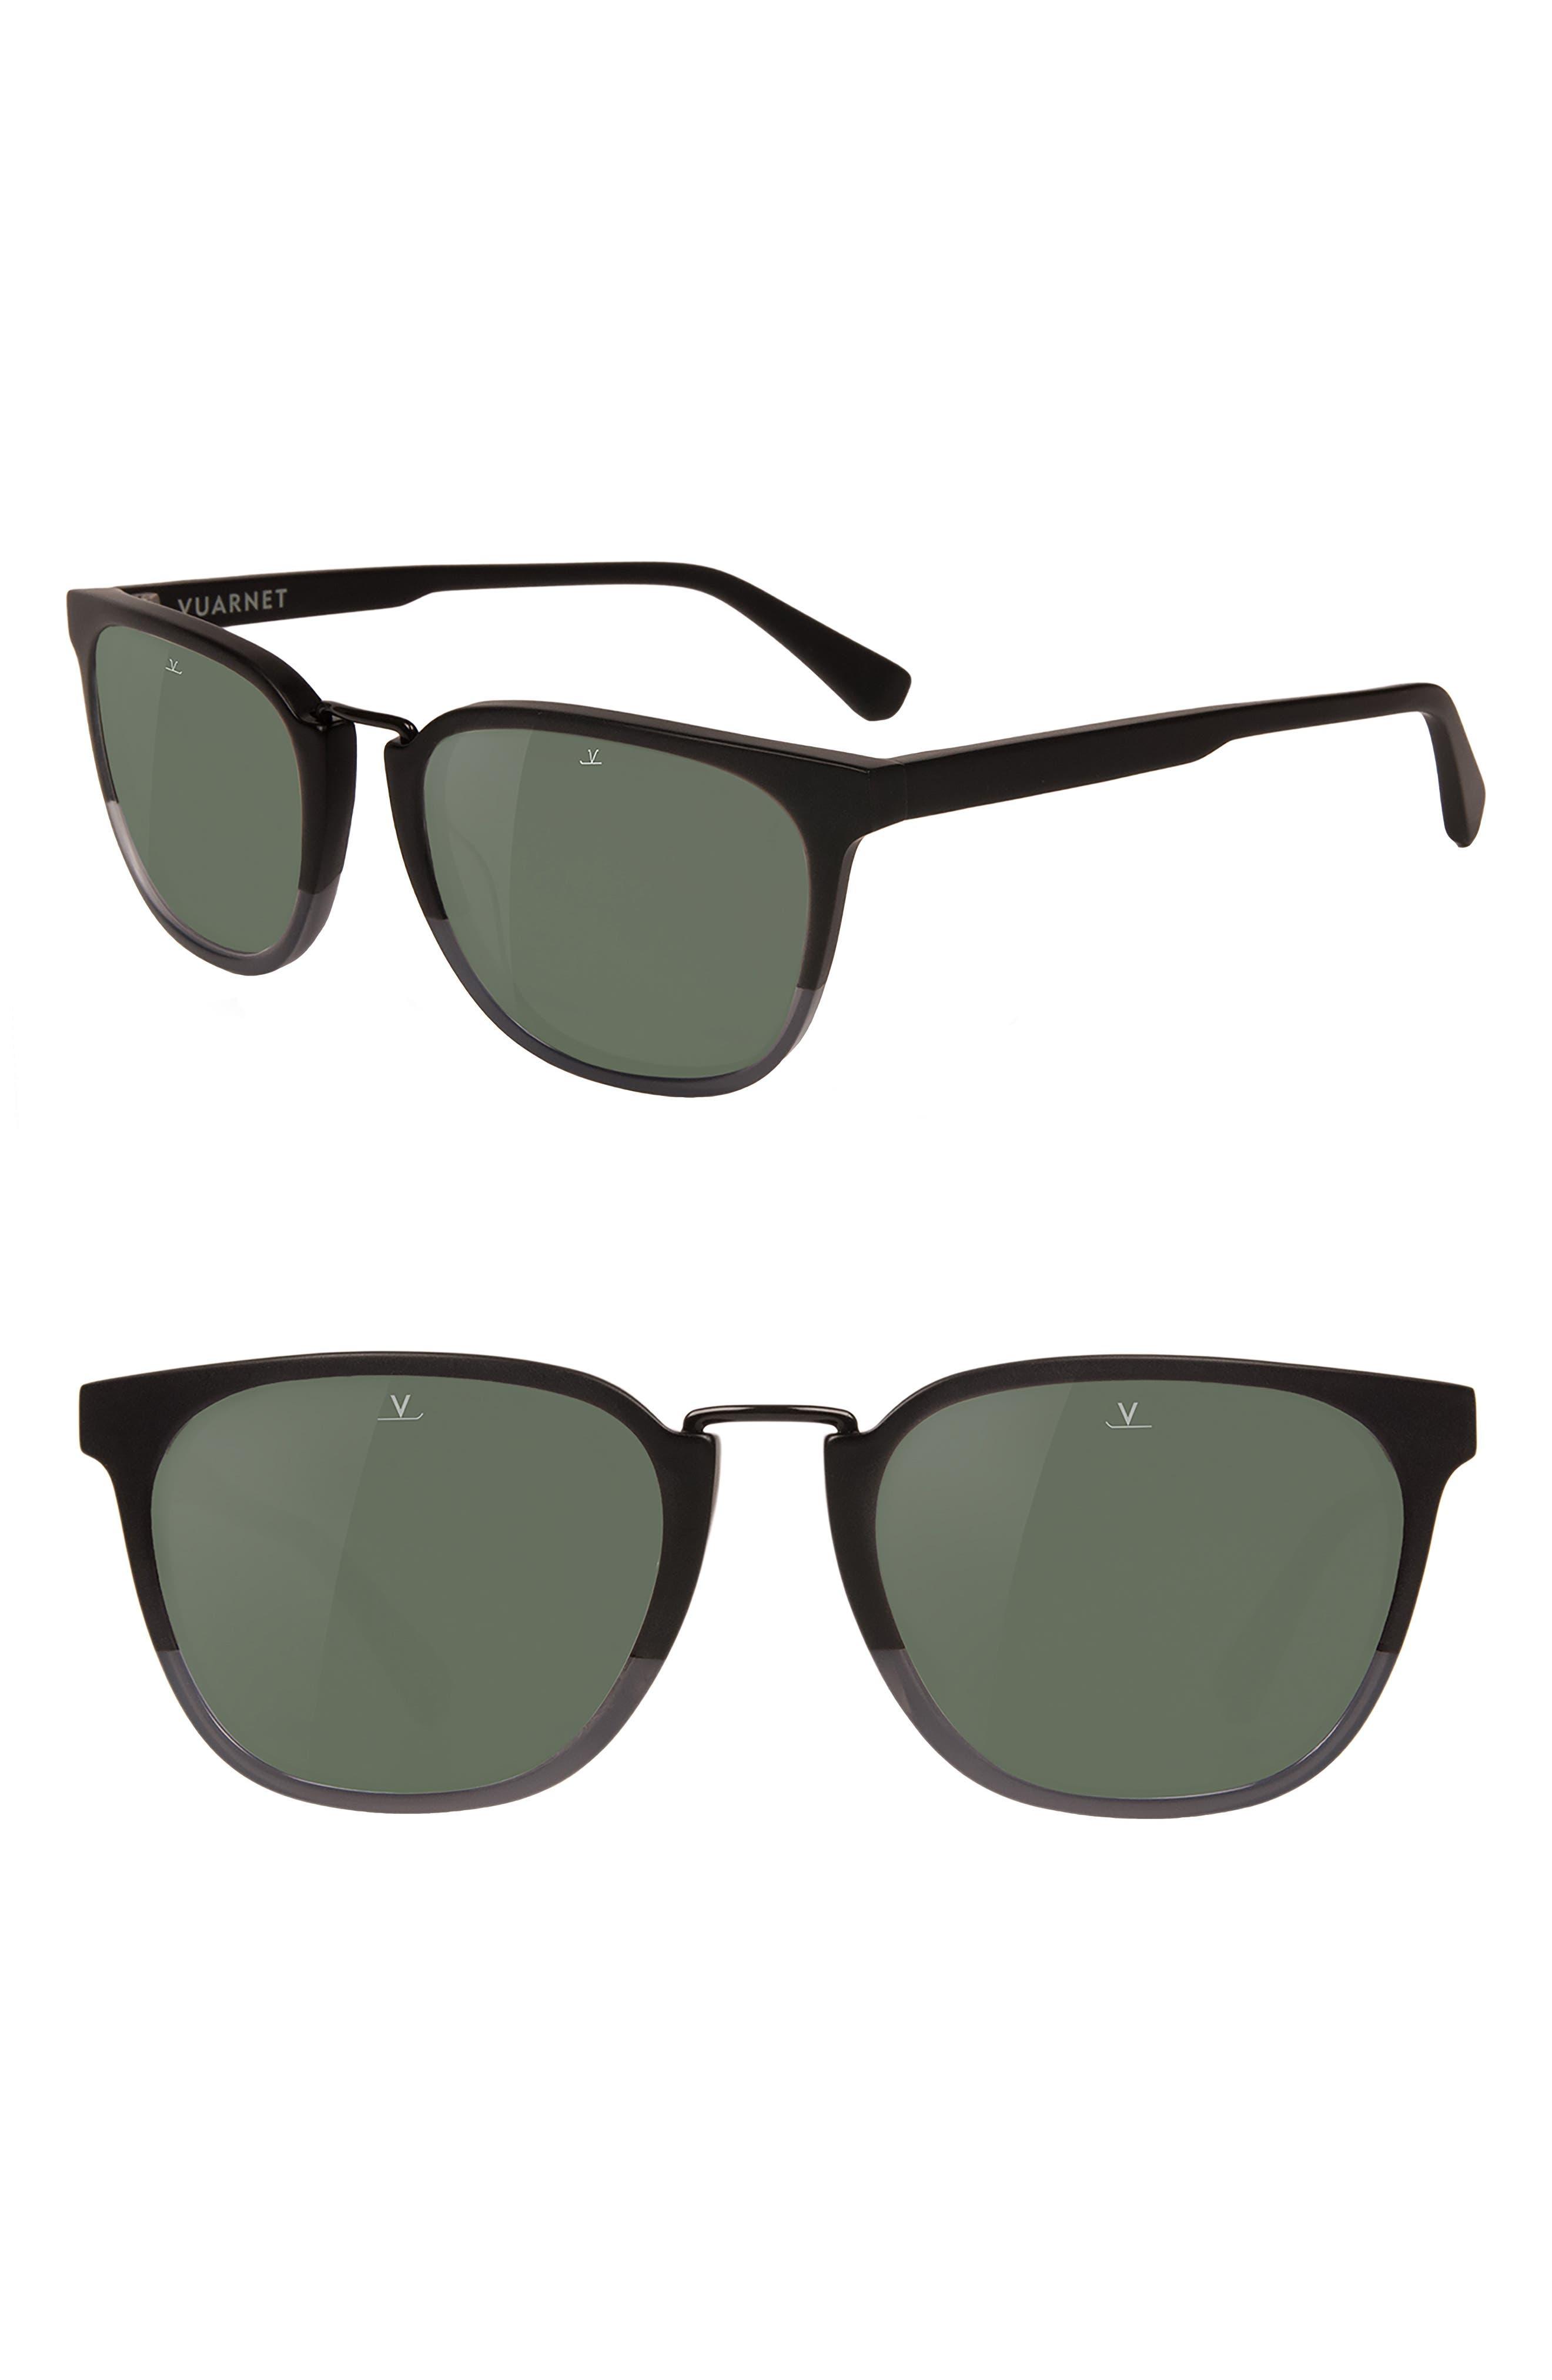 Cable Car 54mm Polarized Sunglasses,                             Main thumbnail 1, color,                             MATT BLACK / GREY POLAR